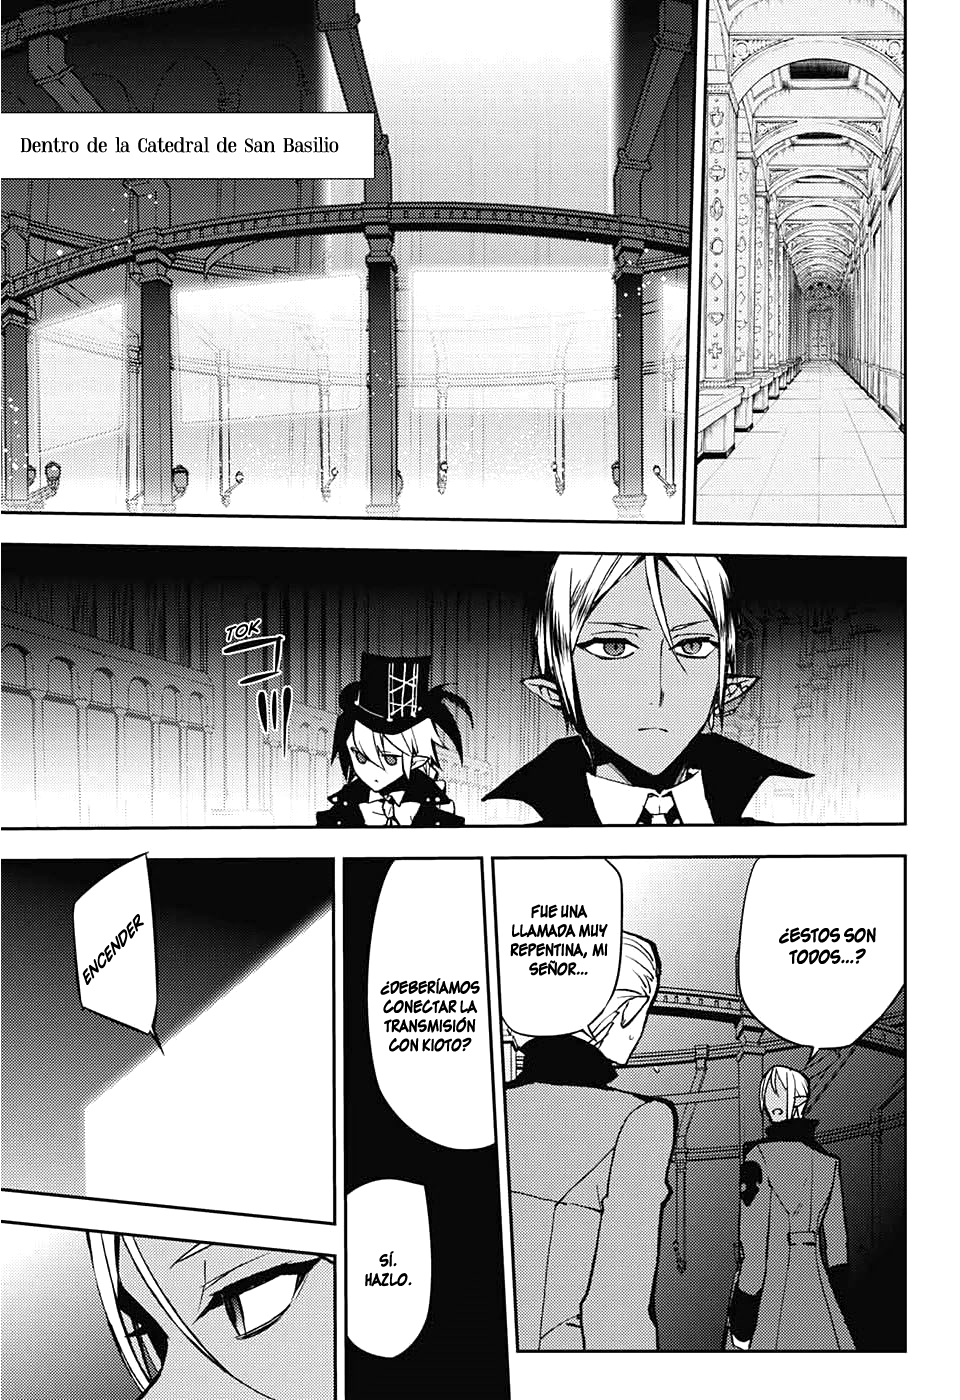 http://c5.ninemanga.com/es_manga/49/3057/445397/f7652e68e0da3f415d7a0cb66da9c510.jpg Page 10